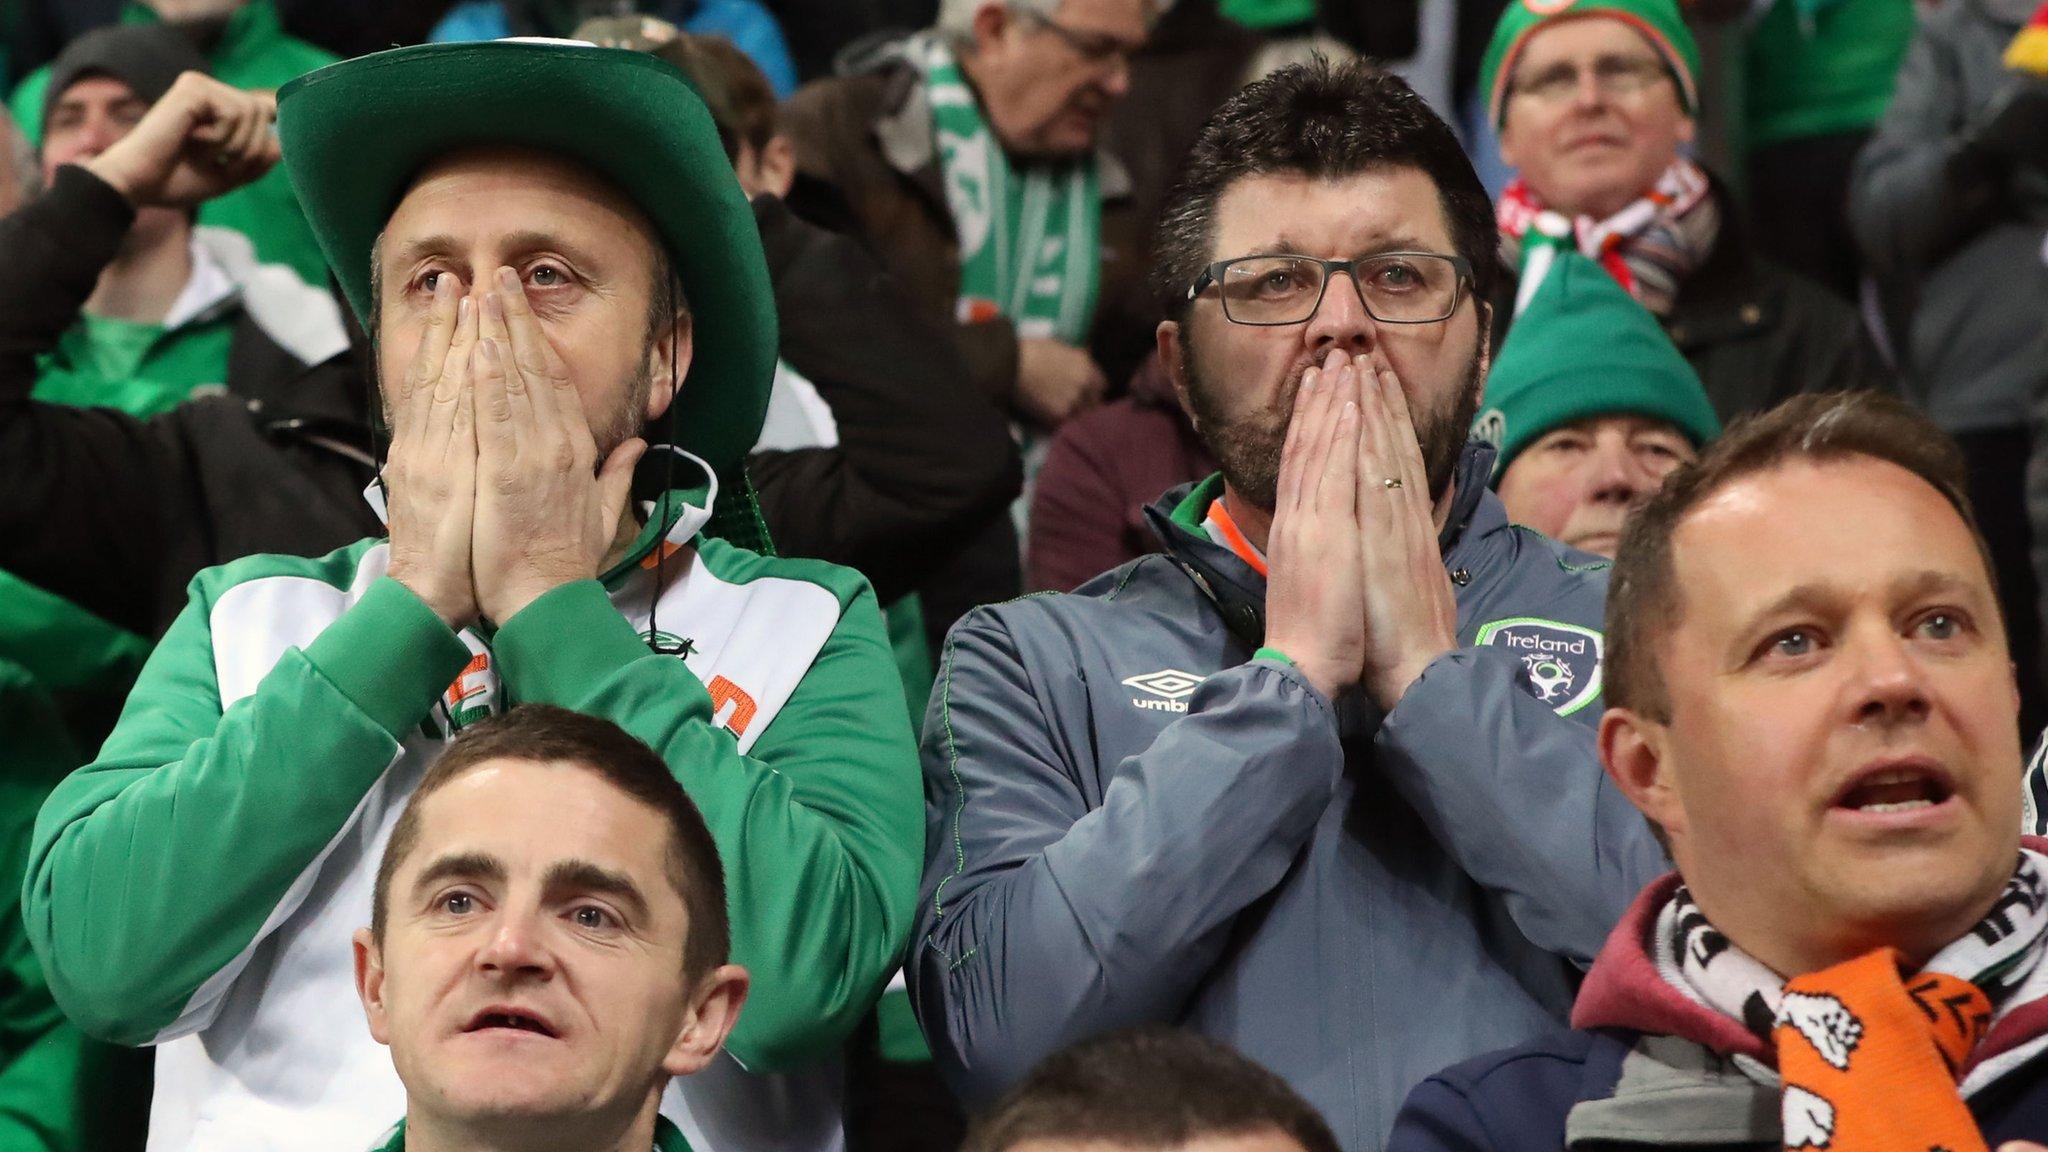 World Cup play-off: Denmark 0-0 Republic of Ireland